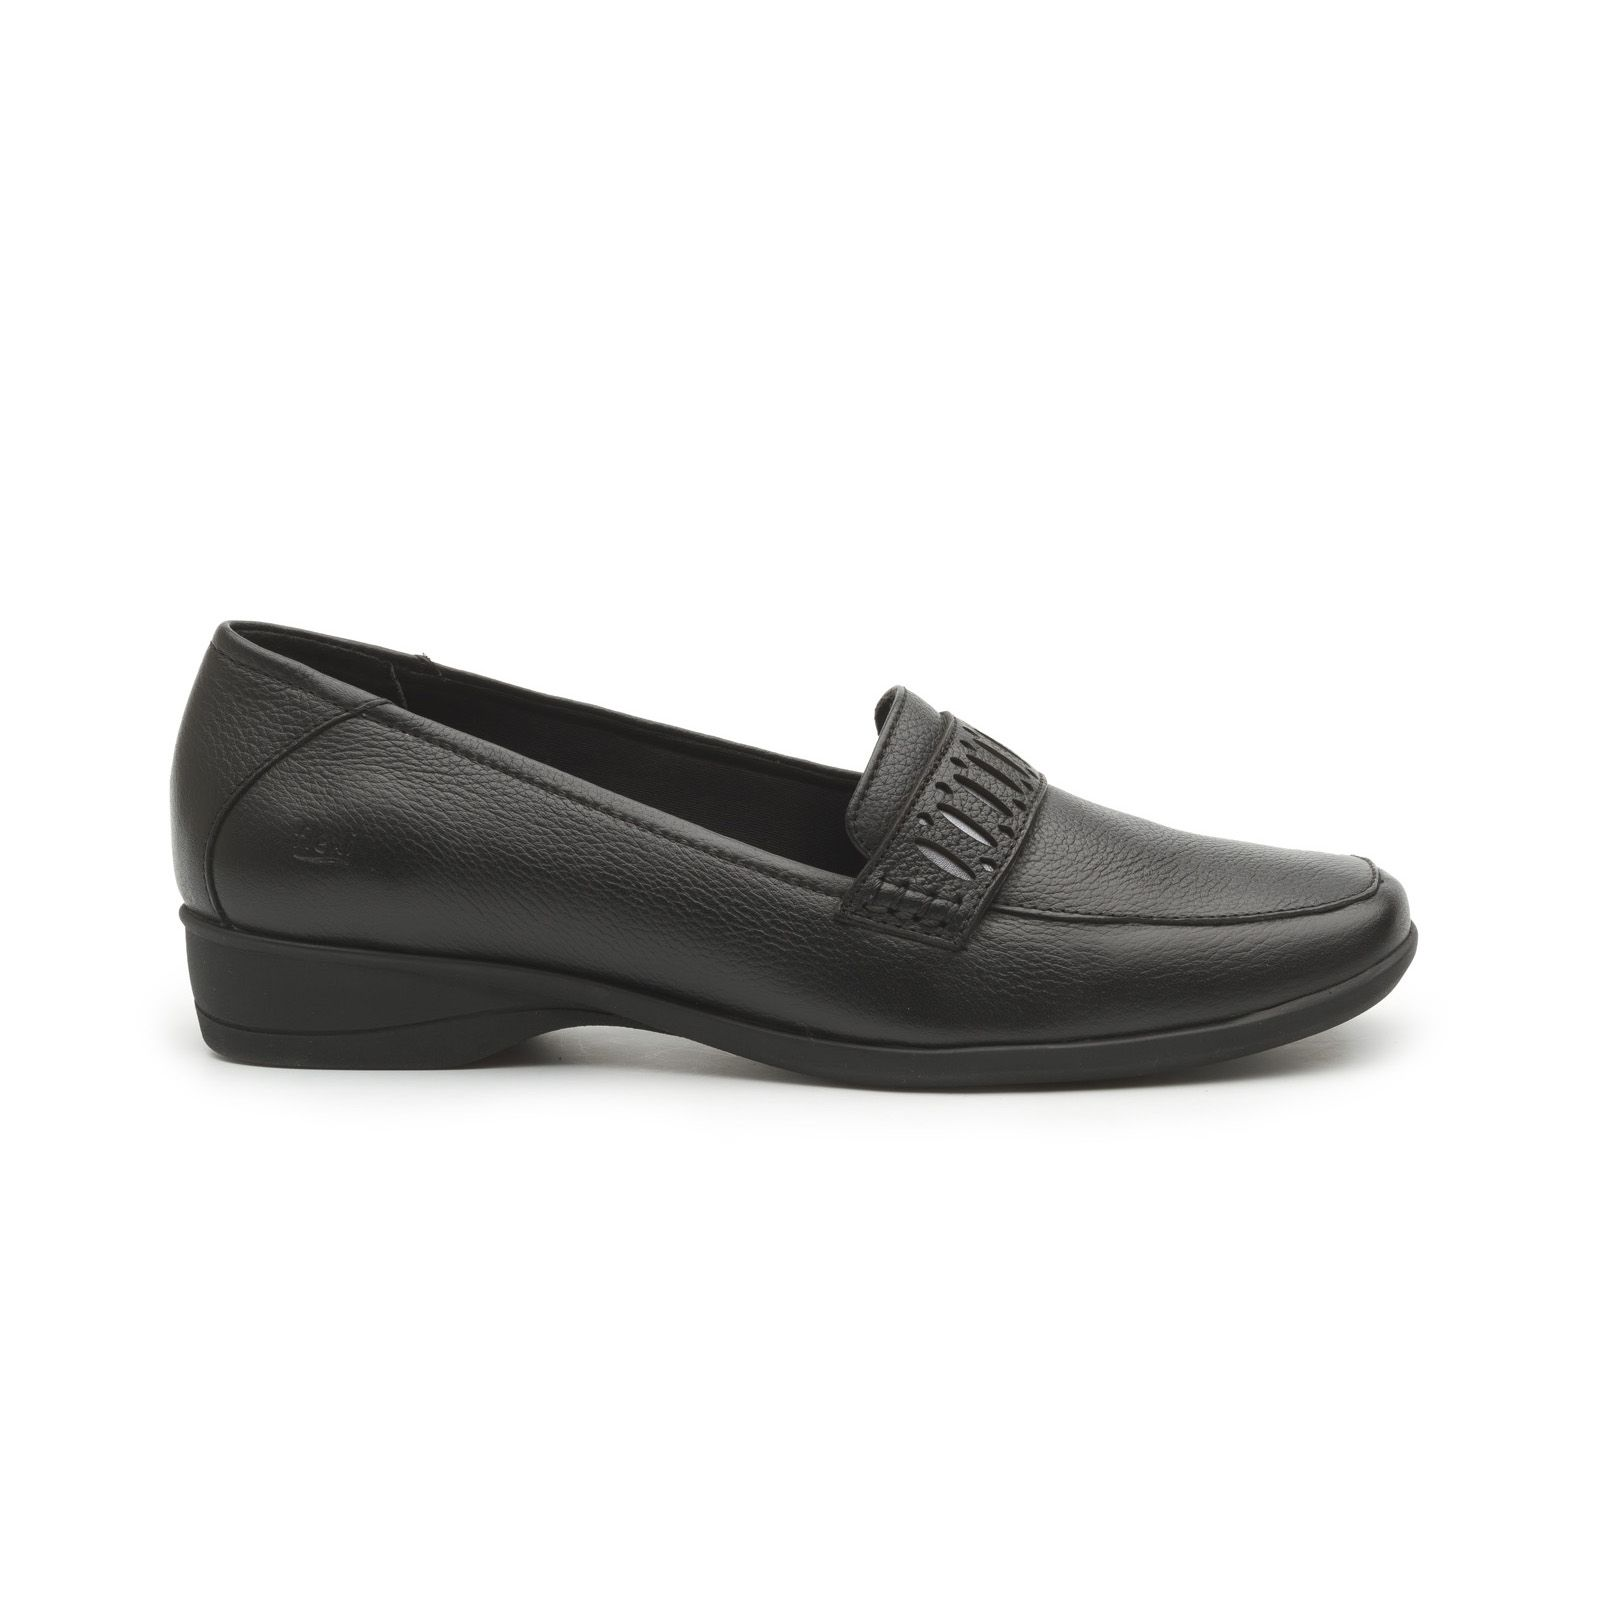 23203 - NEGRO #shoes #zapatos #fashion #moda #goflexi #flexi #clothes #style #estilo #otono #invierno #autumn #winter